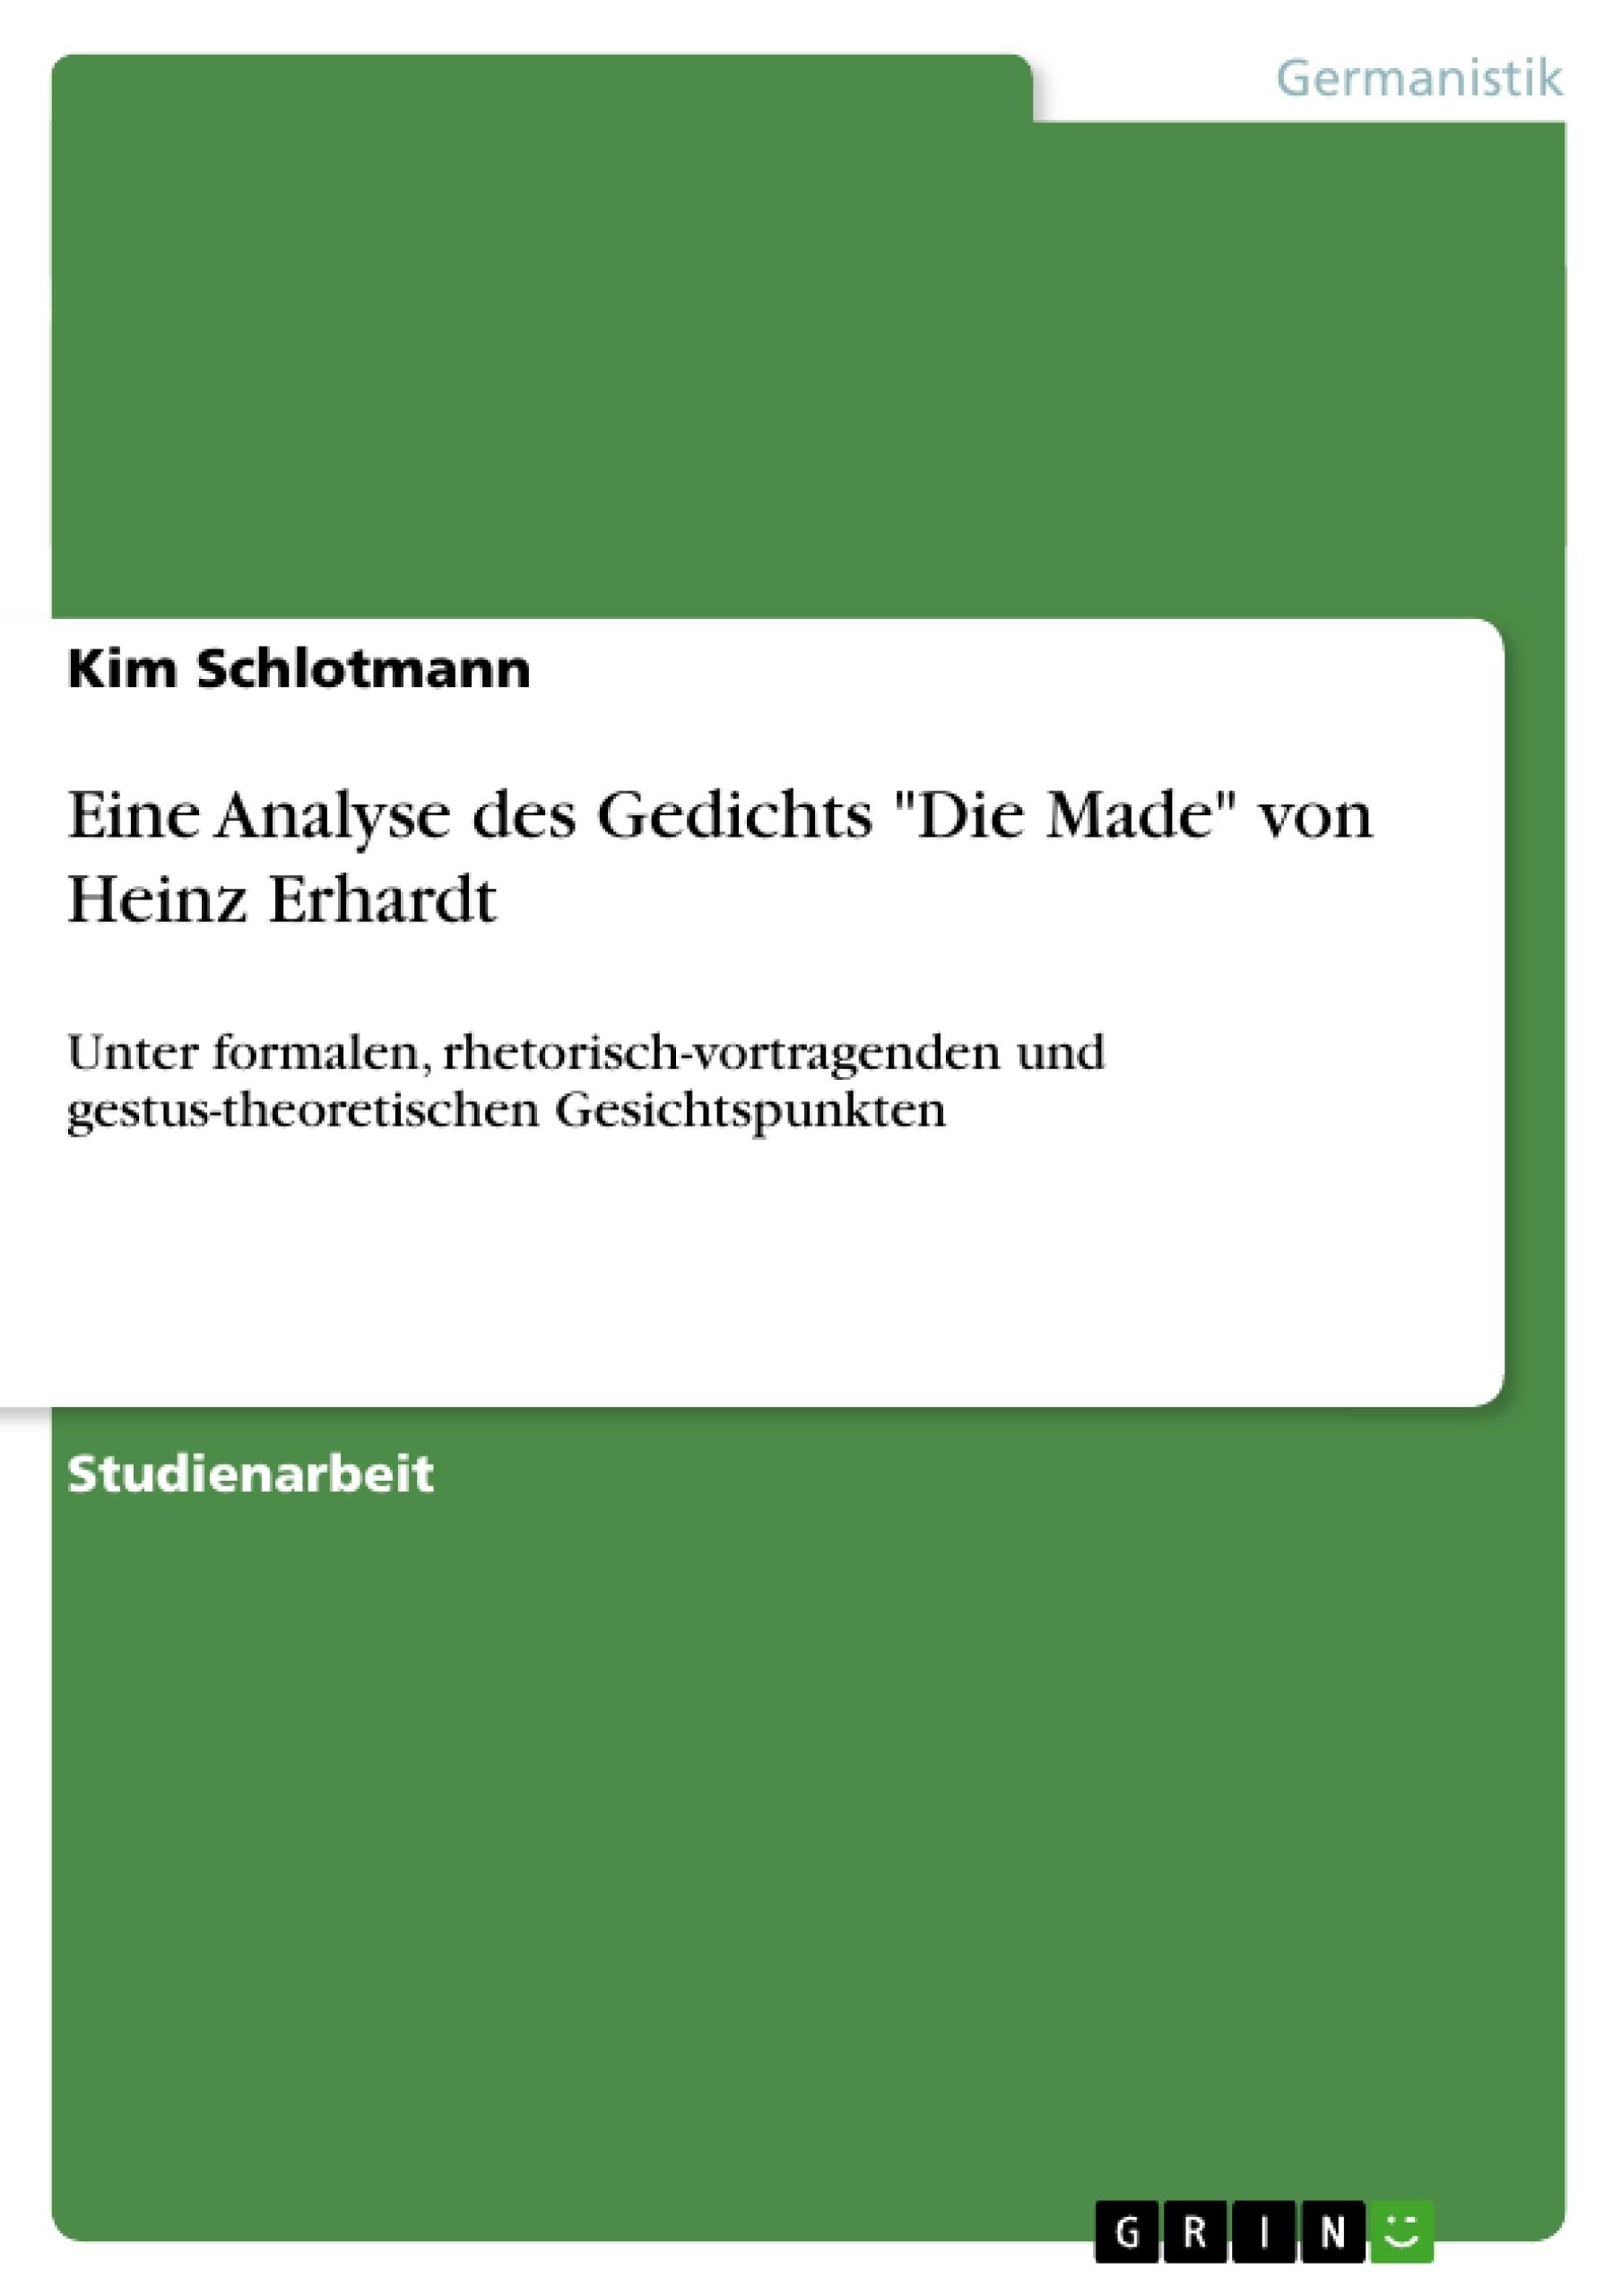 Heinz erhardt gedicht schule interpretation